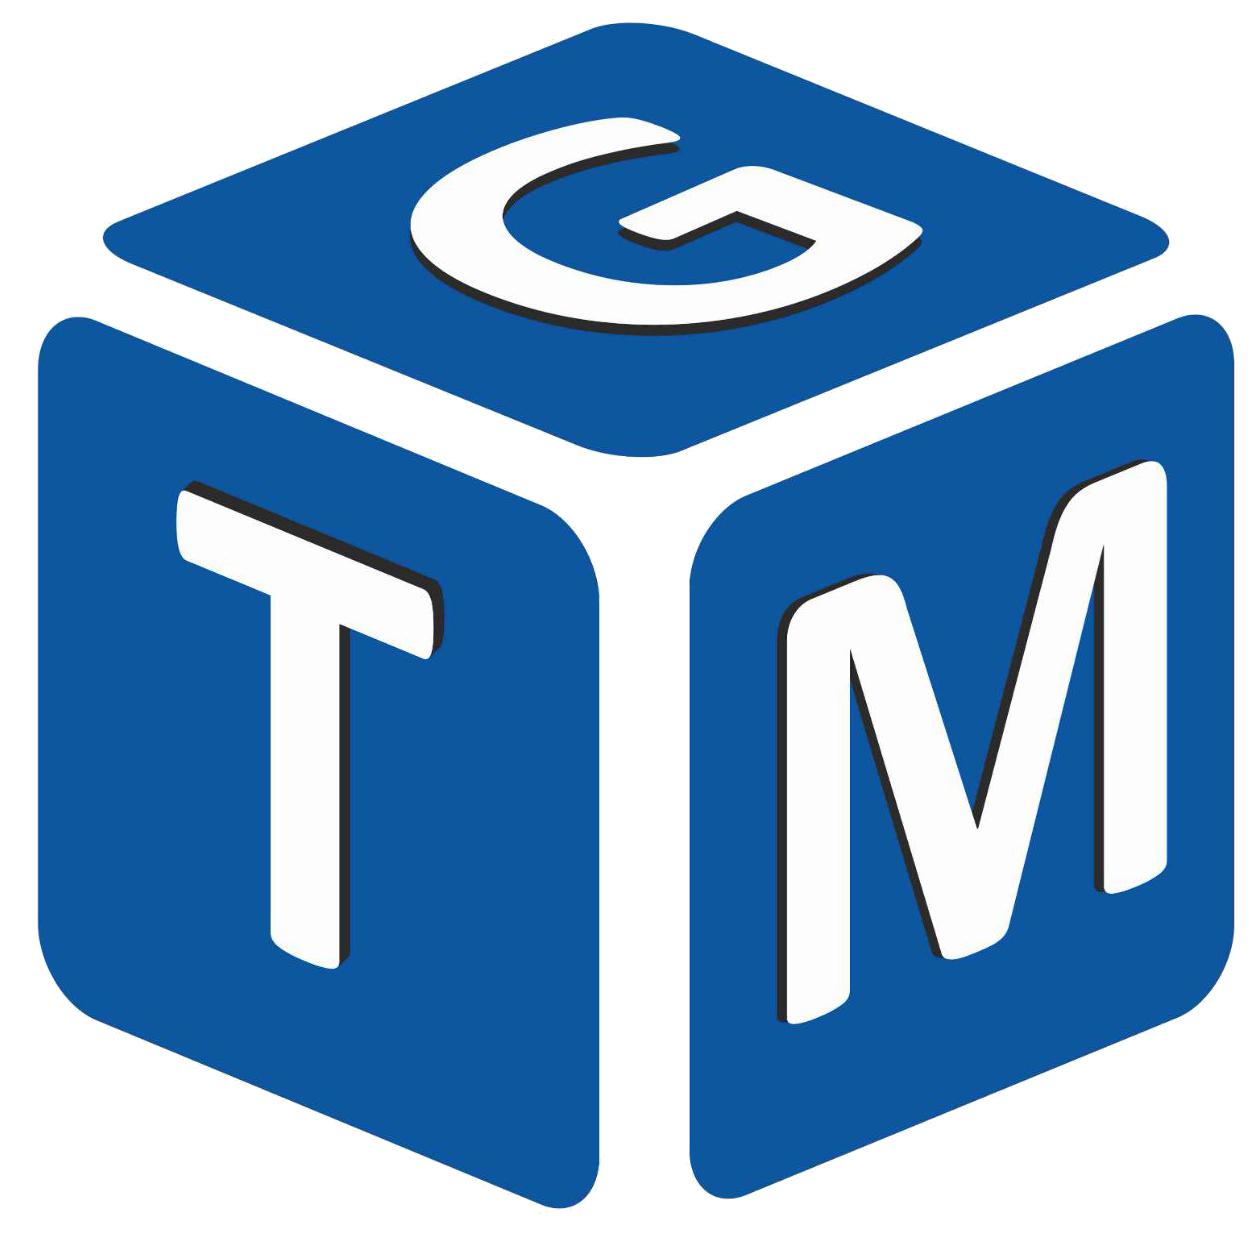 Hidroizolatii, Constructii civile si industriale, TGM Construct